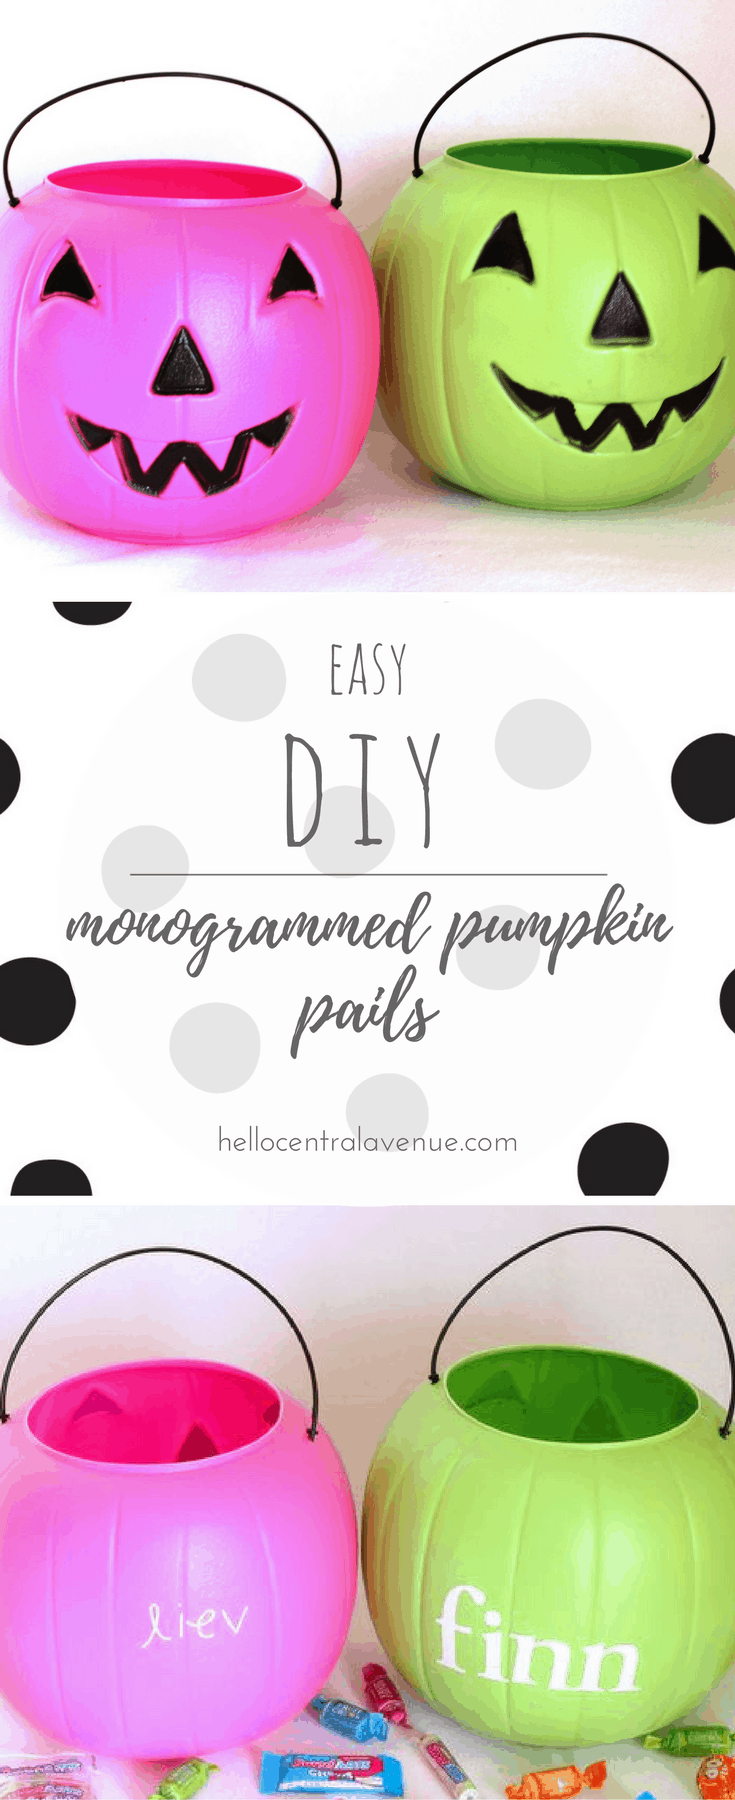 DIY Easy Monogramed Pumpkin Pails for Halloween